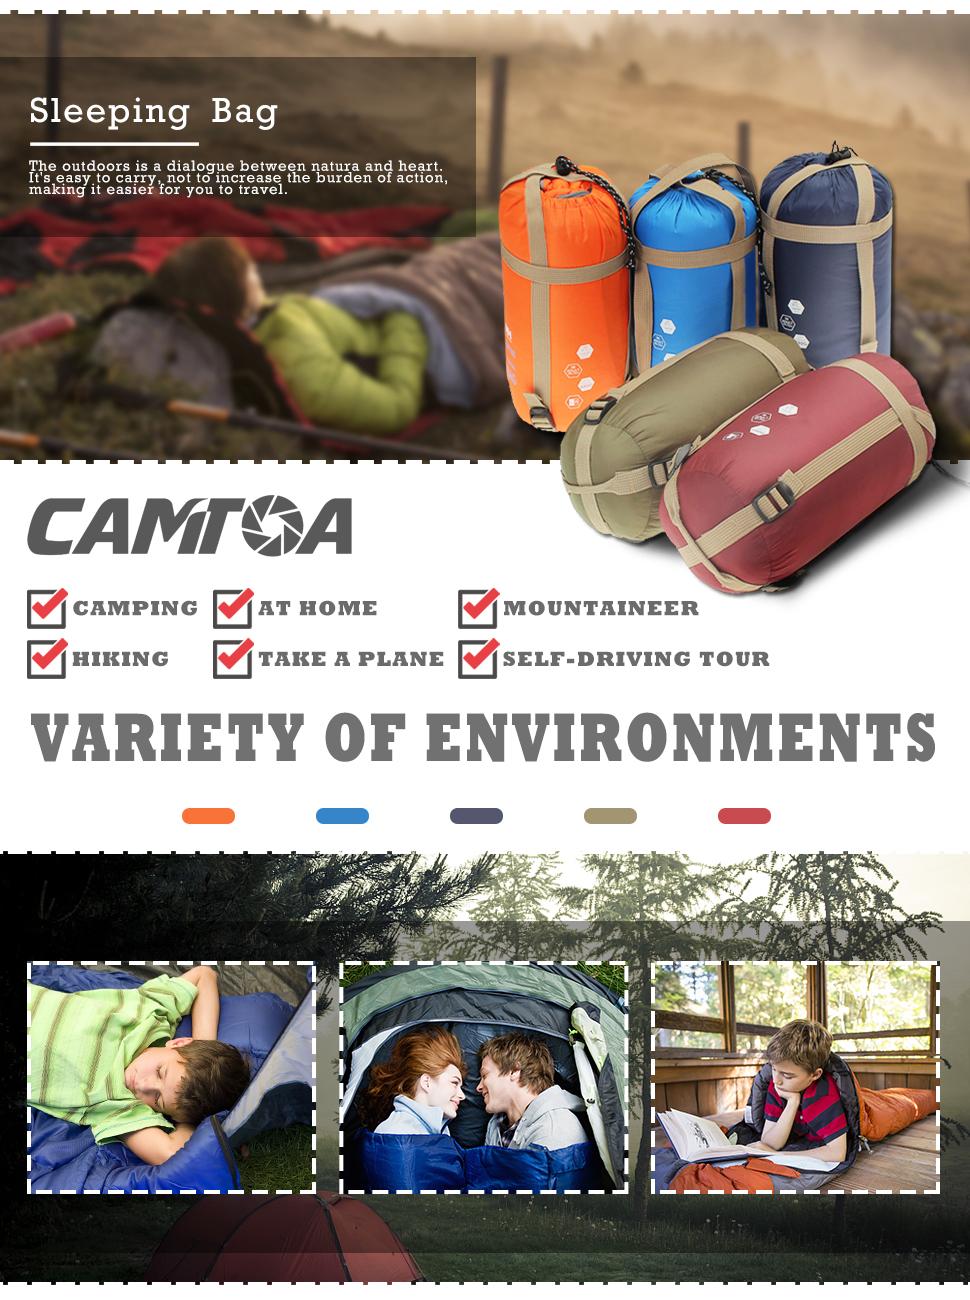 Amazon.com: CAMTOA Saco de dormir ultraligero para acampada ...